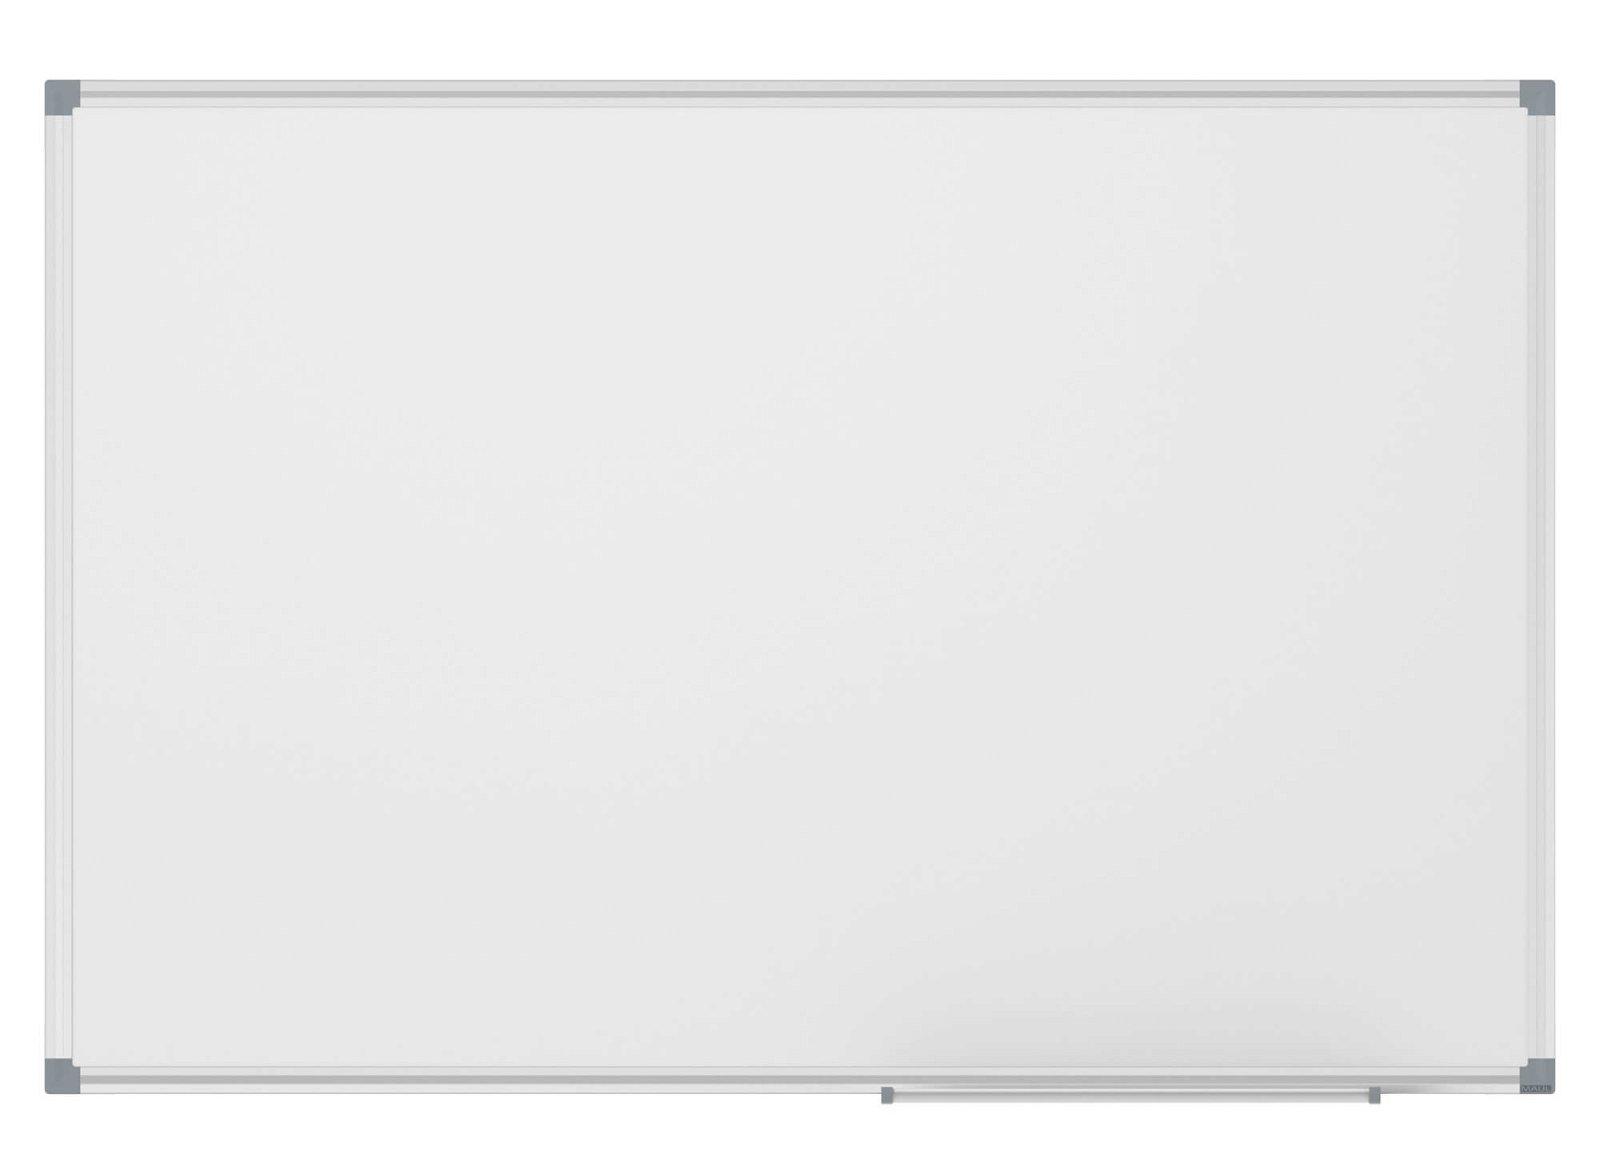 Whiteboard MAULstandard, SB-Verpackung